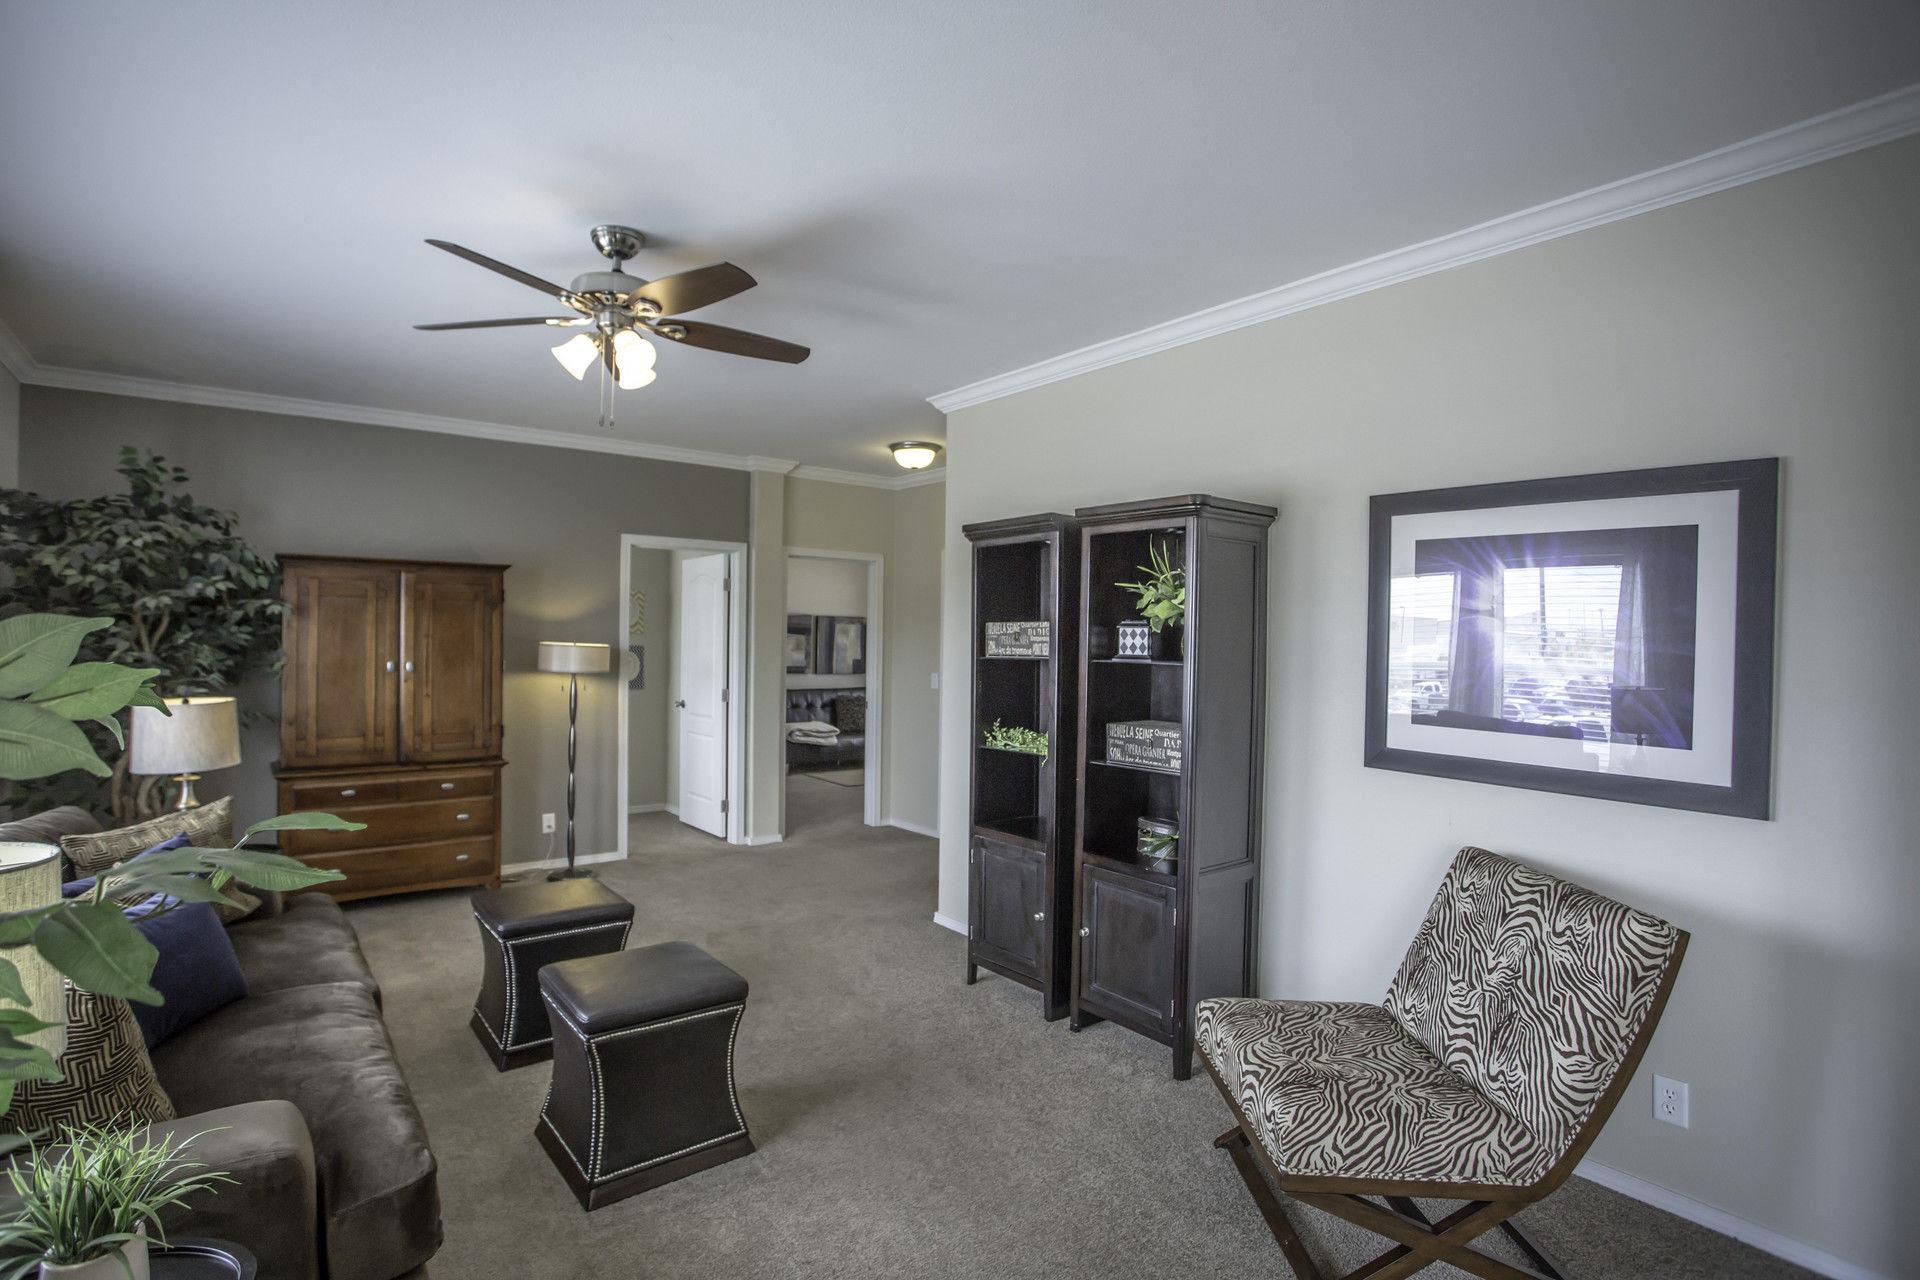 Palm Harbor Modular Homes >> Karsten (Albuquerque) 4+ Bedroom Manufactured Home Karsten ...